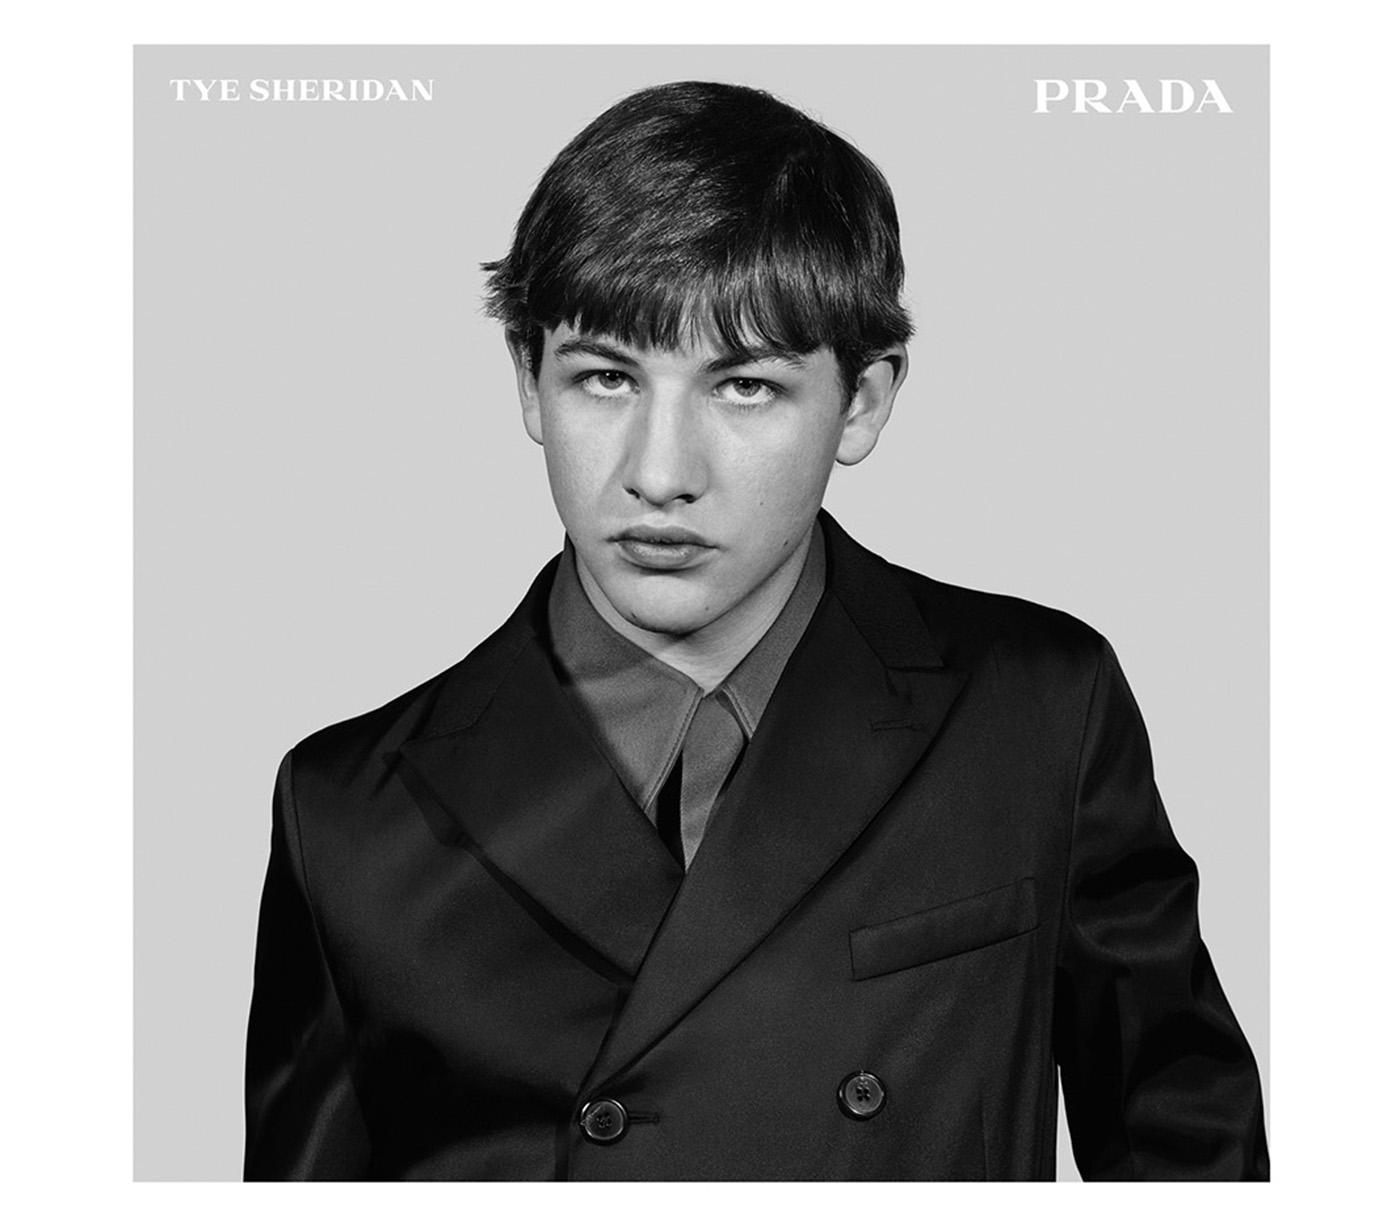 Tye Sheridan per Prada FW15 Menswear Adv Campaign